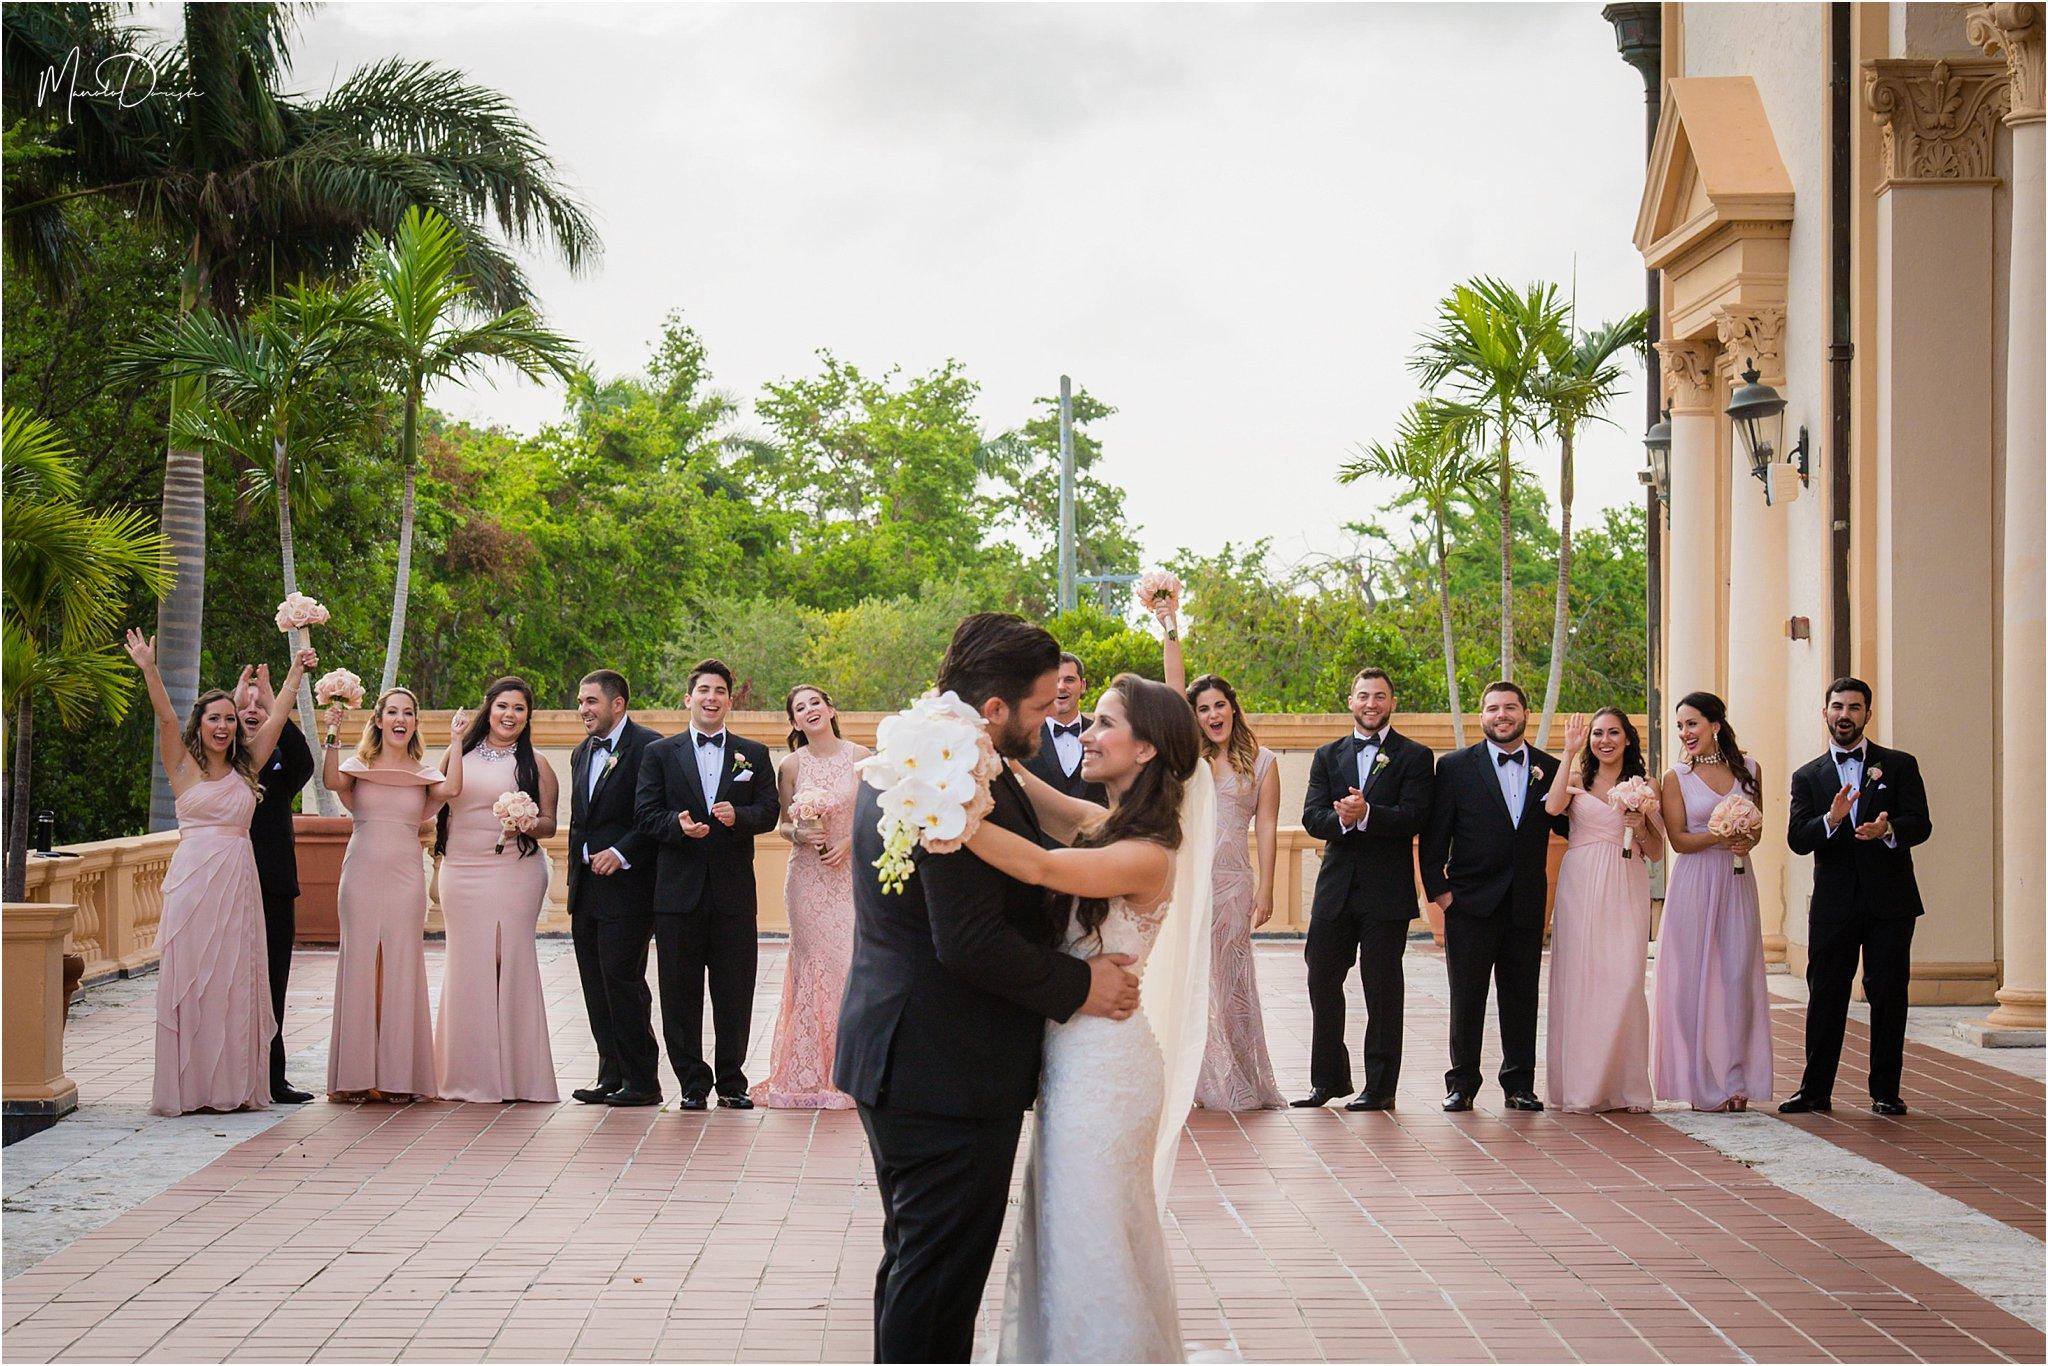 0167_ManoloDoreste_InFocusStudios_Wedding_Family_Photography_Miami_MiamiPhotographer.jpg